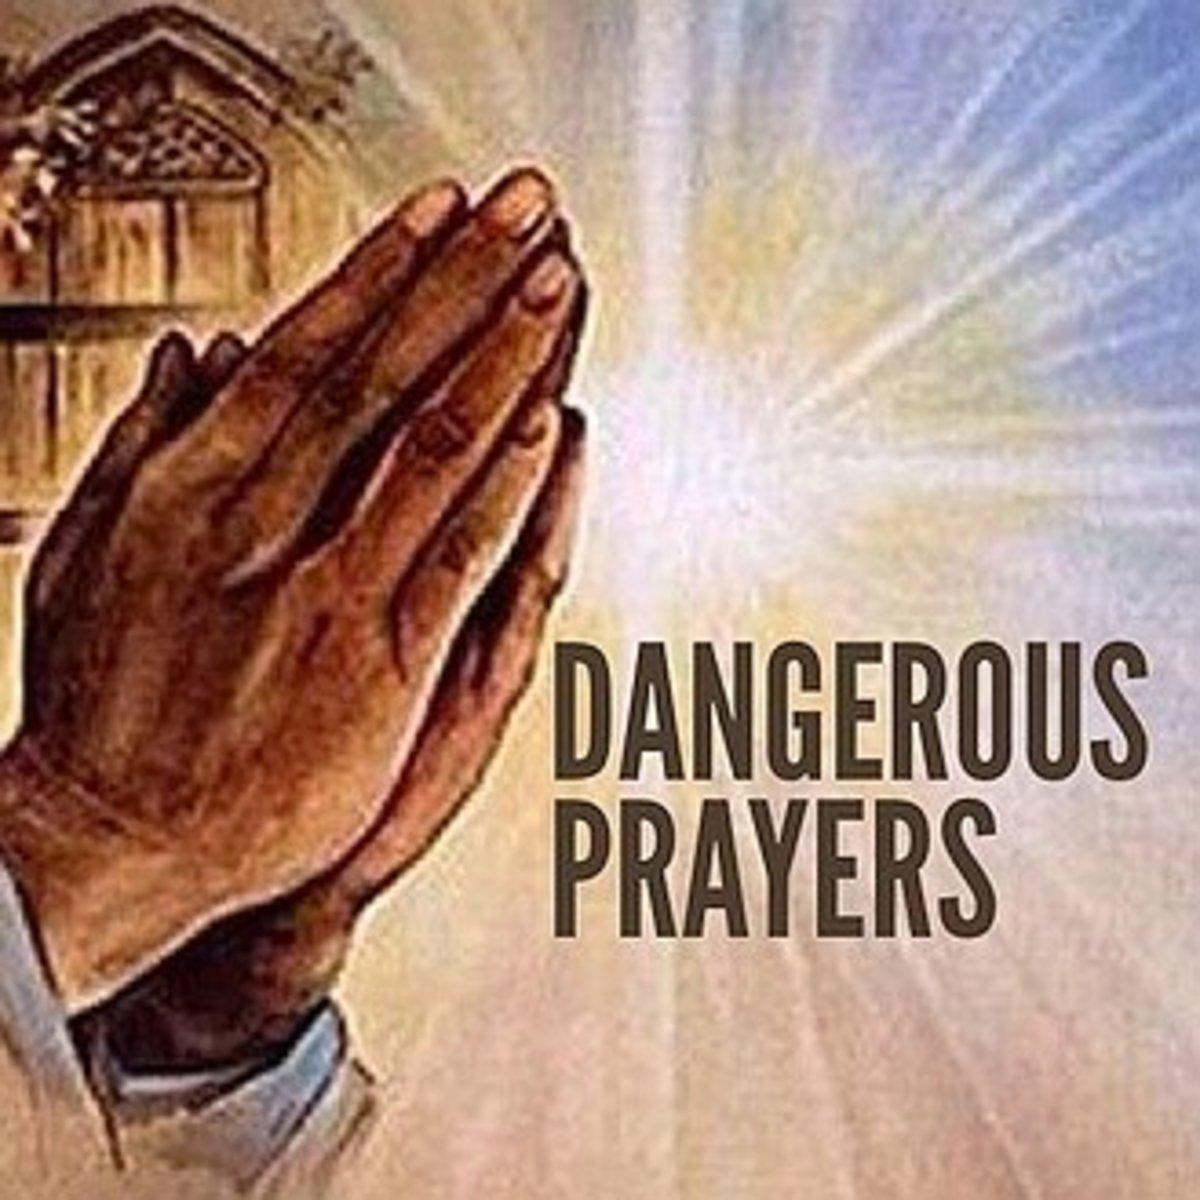 Six Dangerous Prayers to Pray